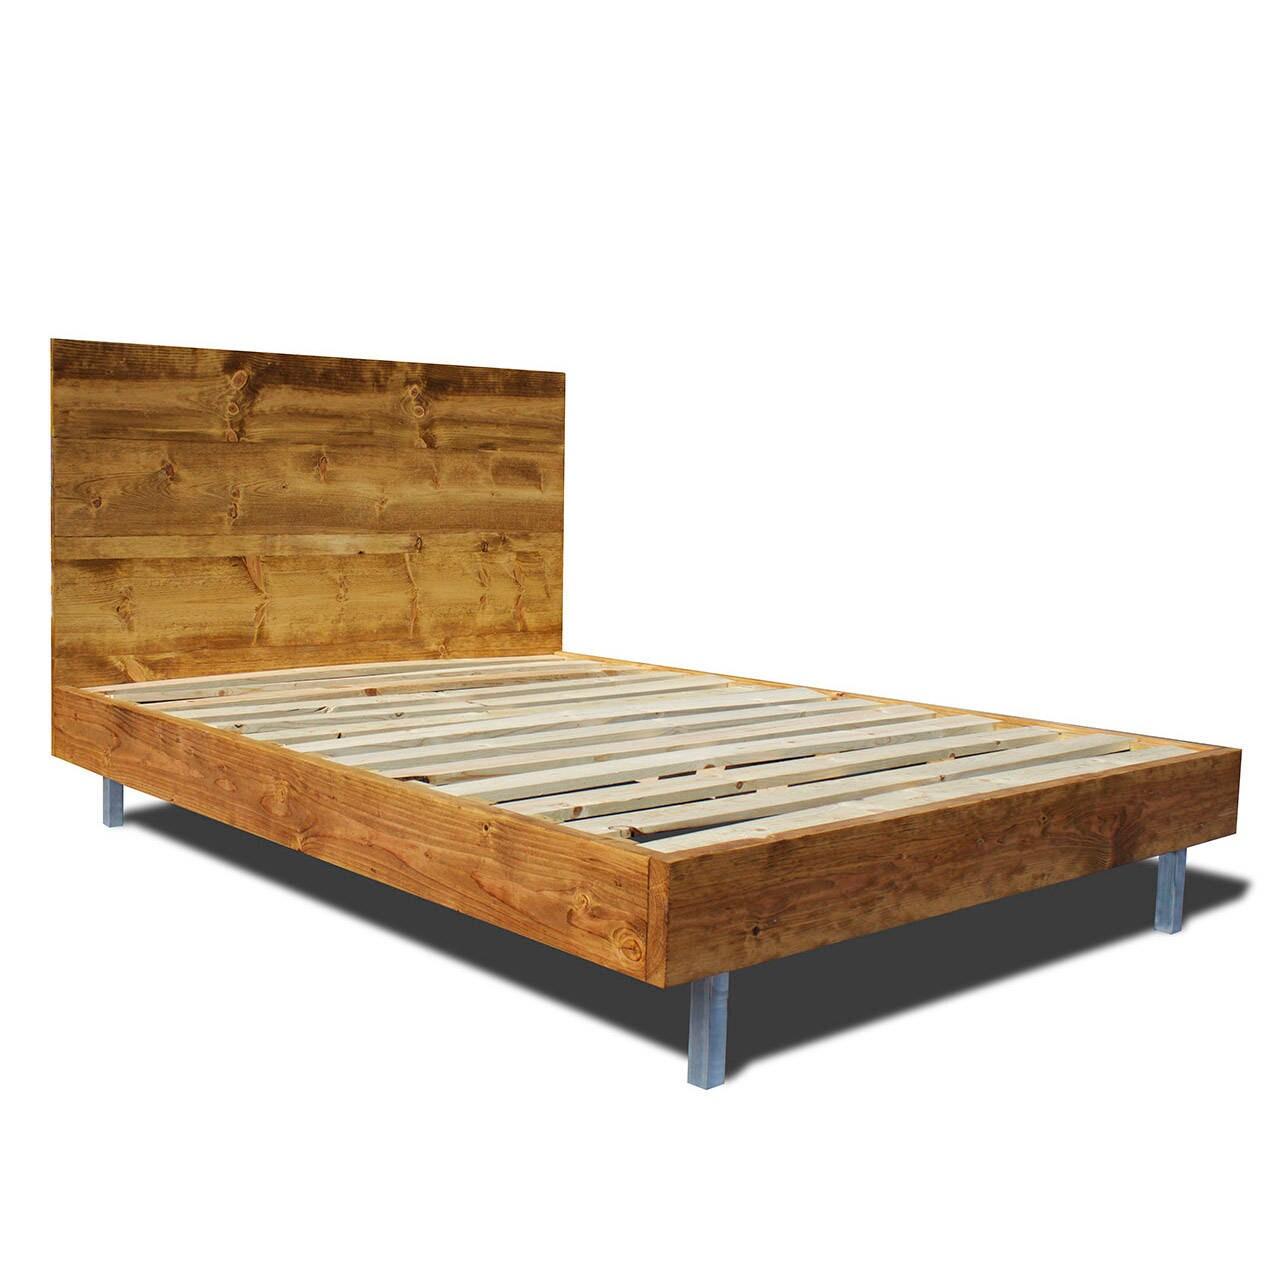 Rustic wood platform bed - Platform Bed Frame And Headboard Set With Metal Legs Modern Bed Frame Modern And